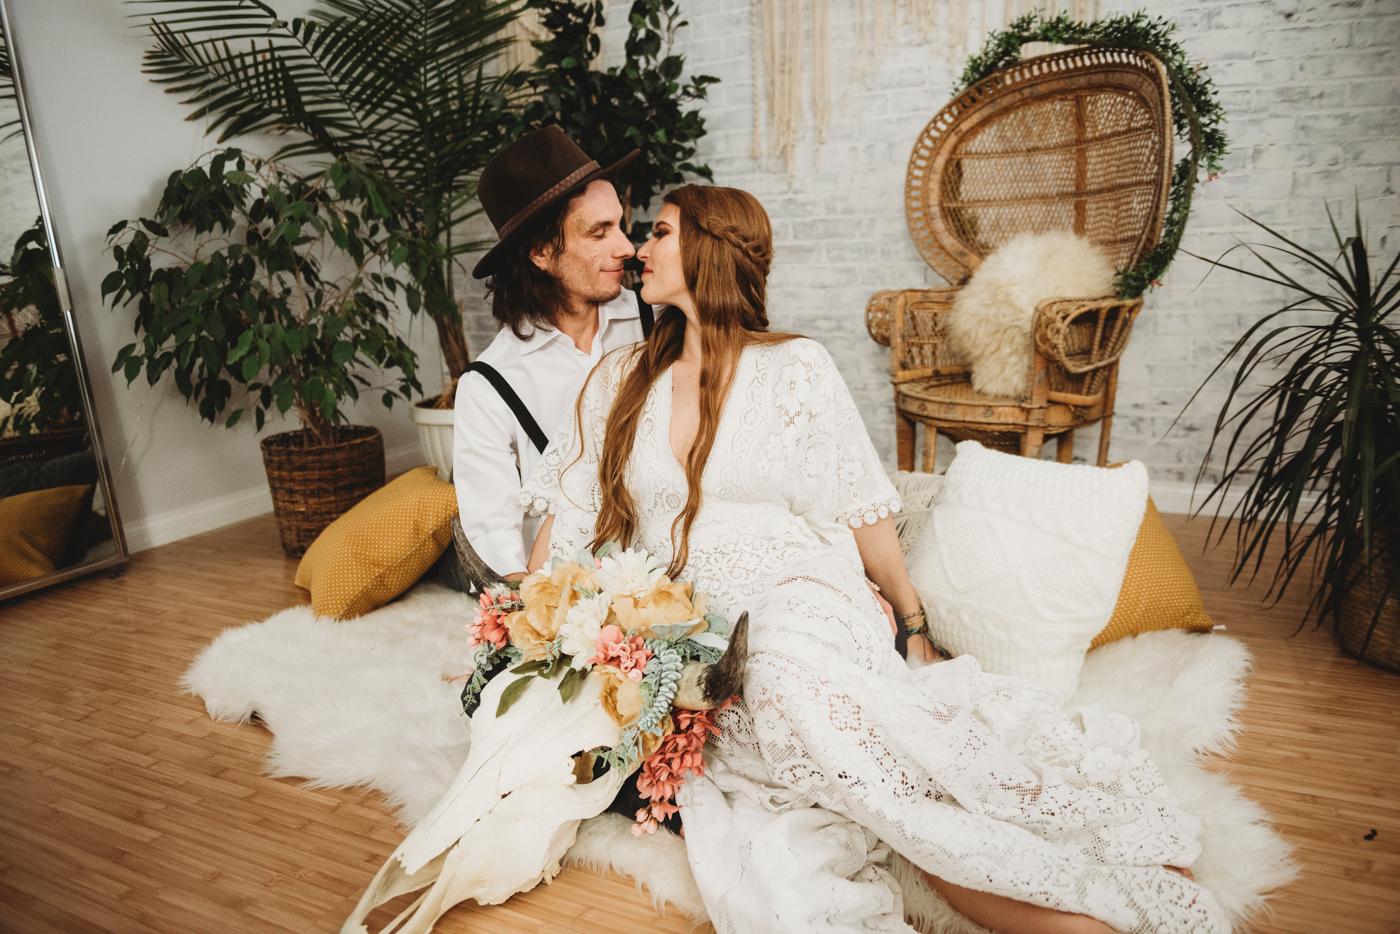 FortSt.John_photographer_TyraEPhotography_Wedding_Couple_Family_Photograhy_DawsonCreek_Elopement_Bride_Boduoir_Portraits-4816.jpg